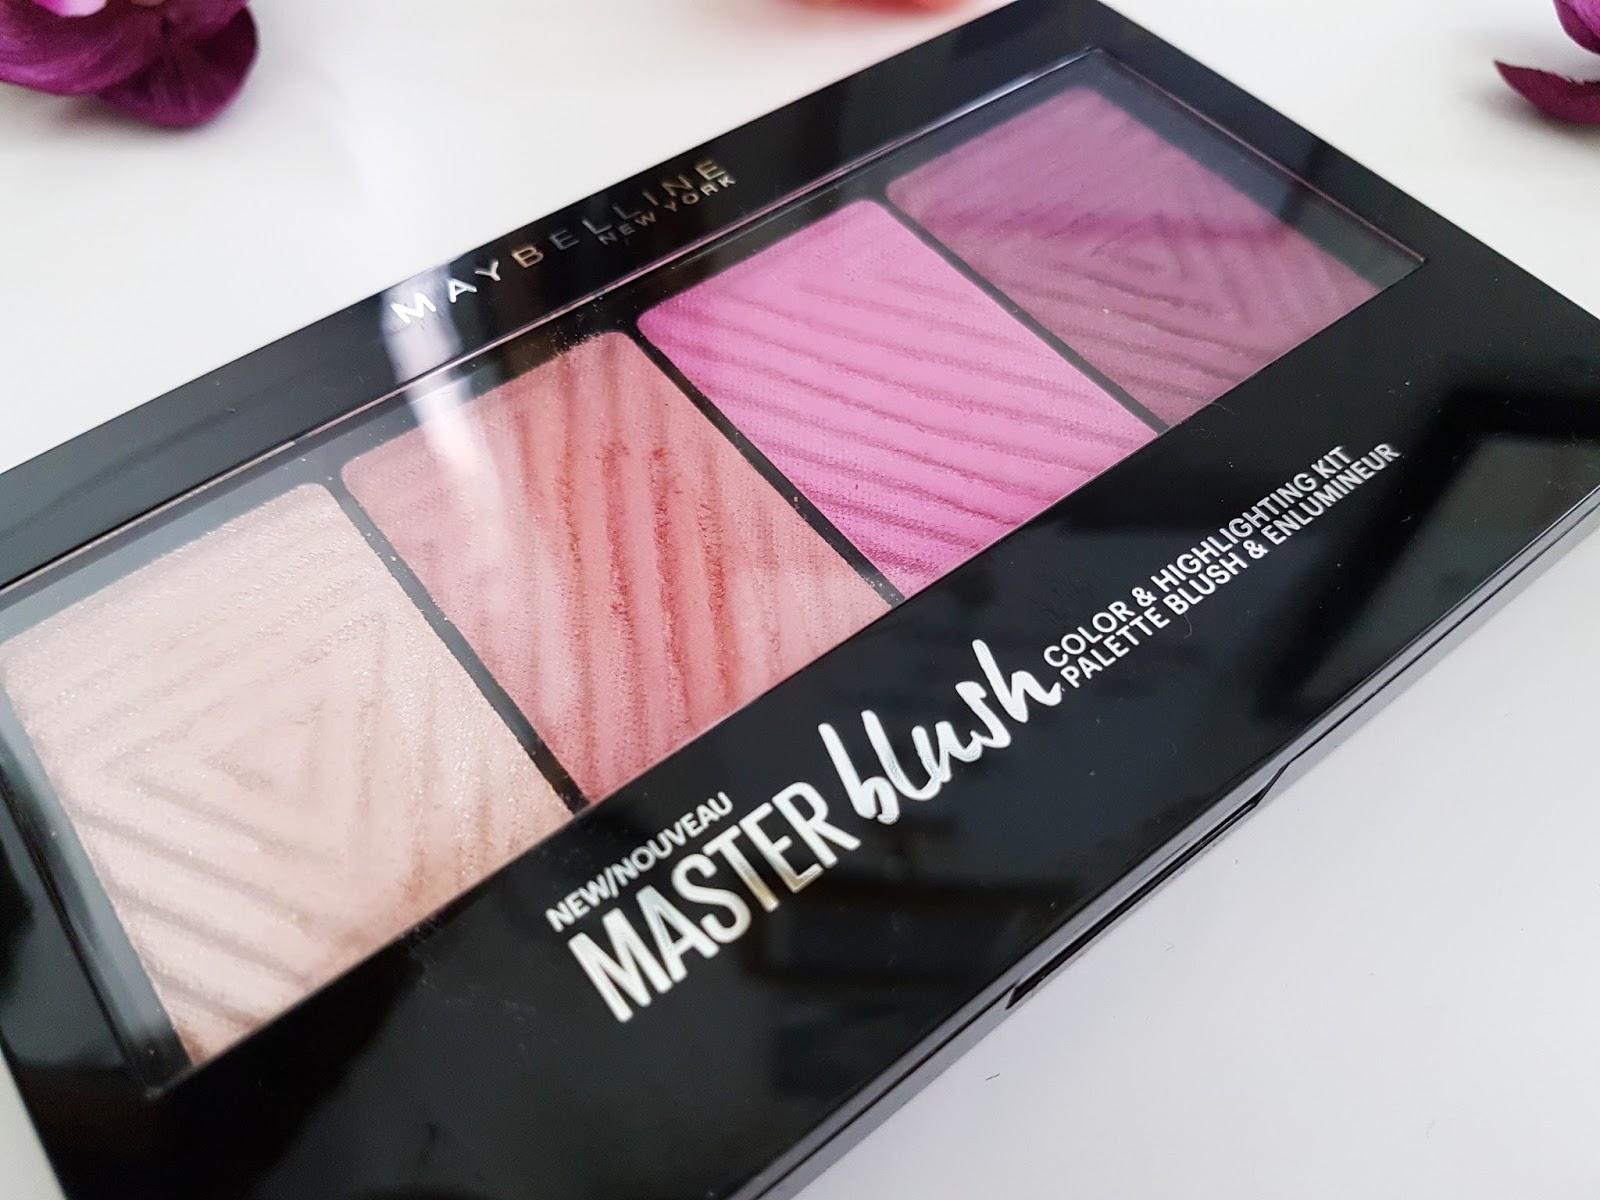 avis-poudre-master-blush-maybelline-concours-mama-syca-beaute